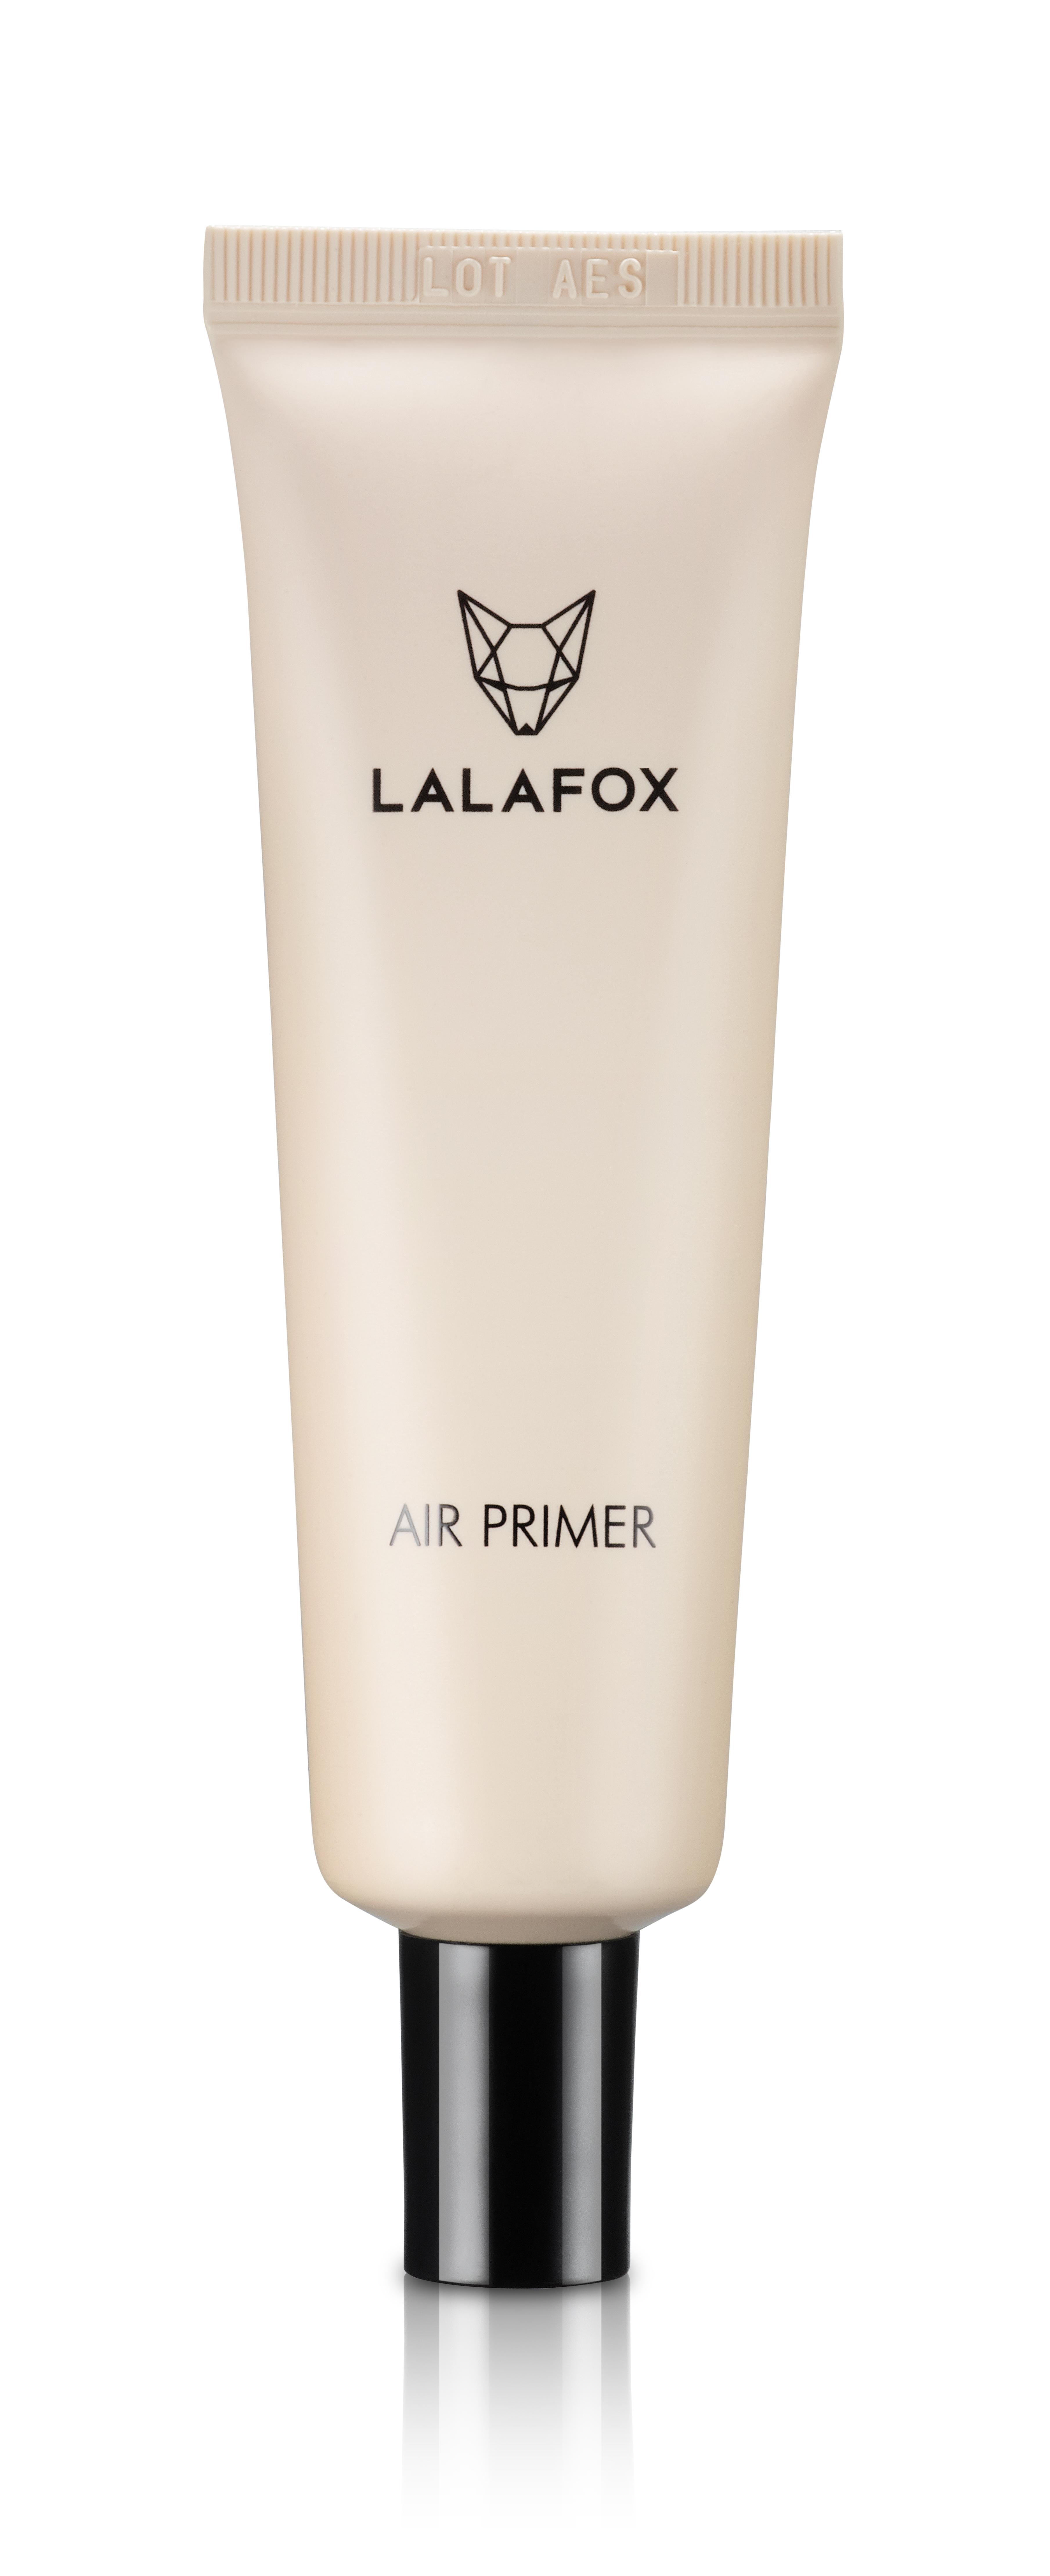 AIR PRIMER